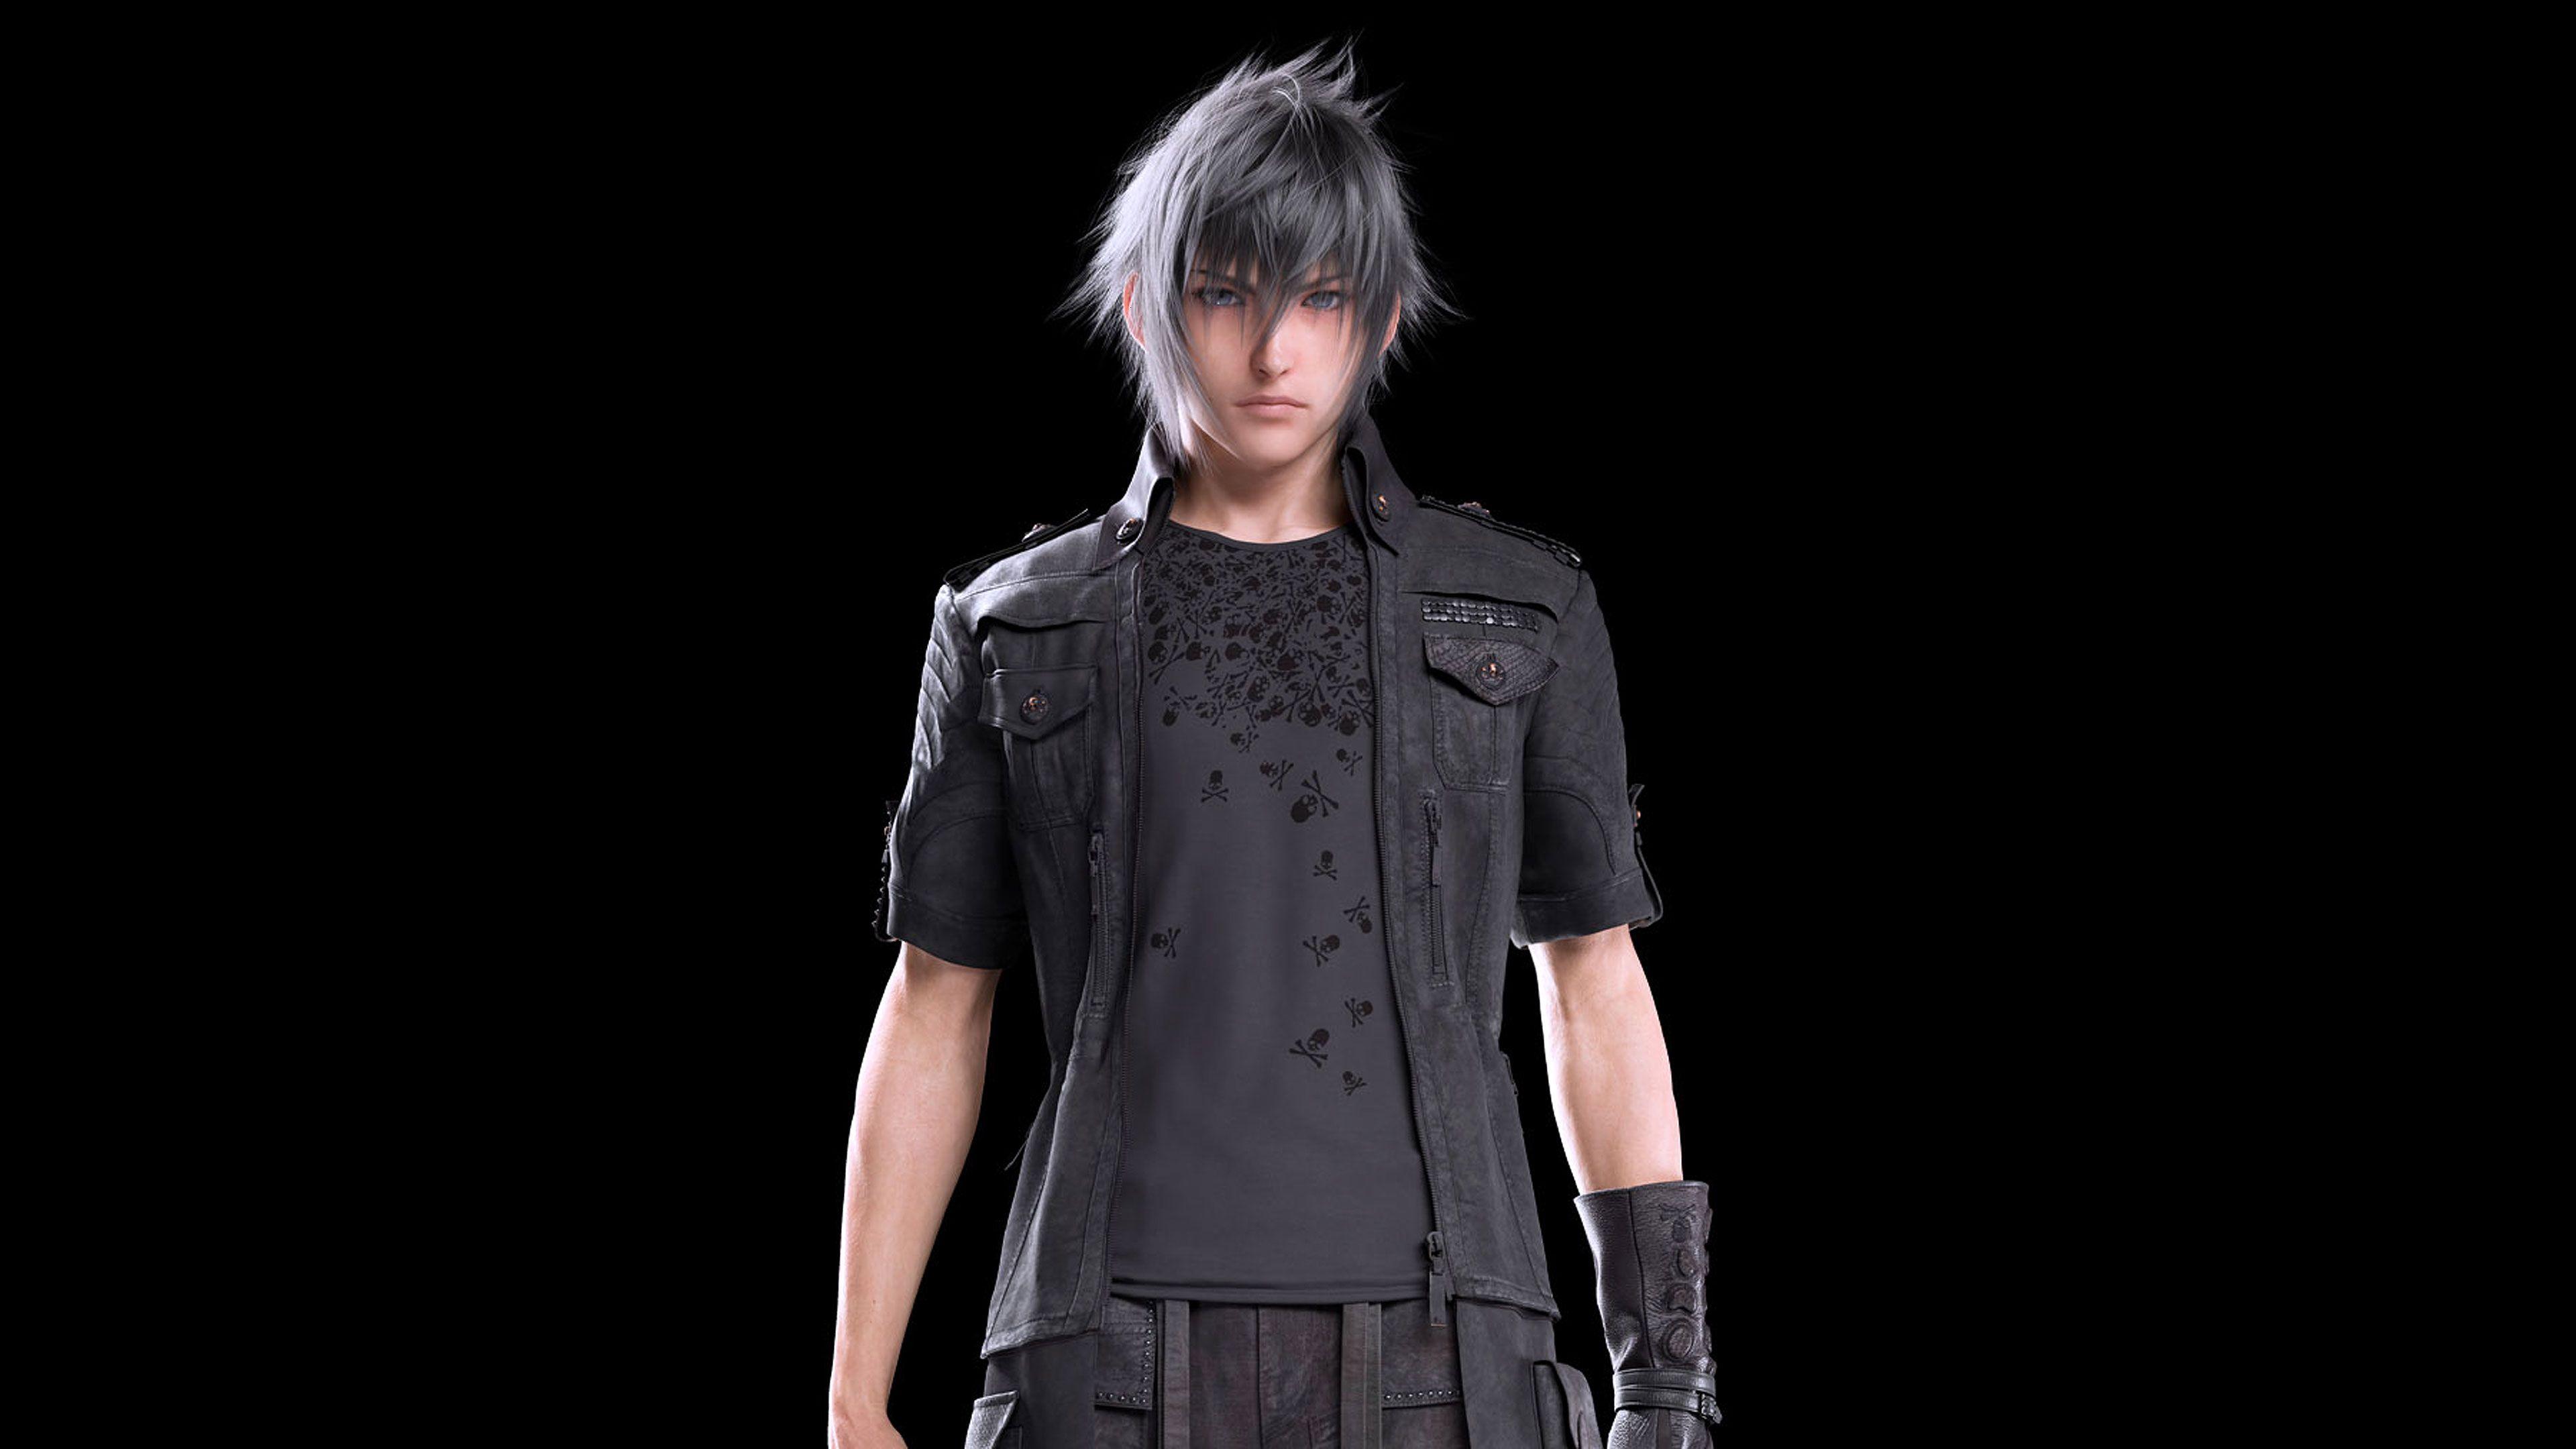 4k Noctis Lucis Caelum Final Fantasy Xv Hd Games 4k: Final Fantasy XV 3840x2160 Wallpaper